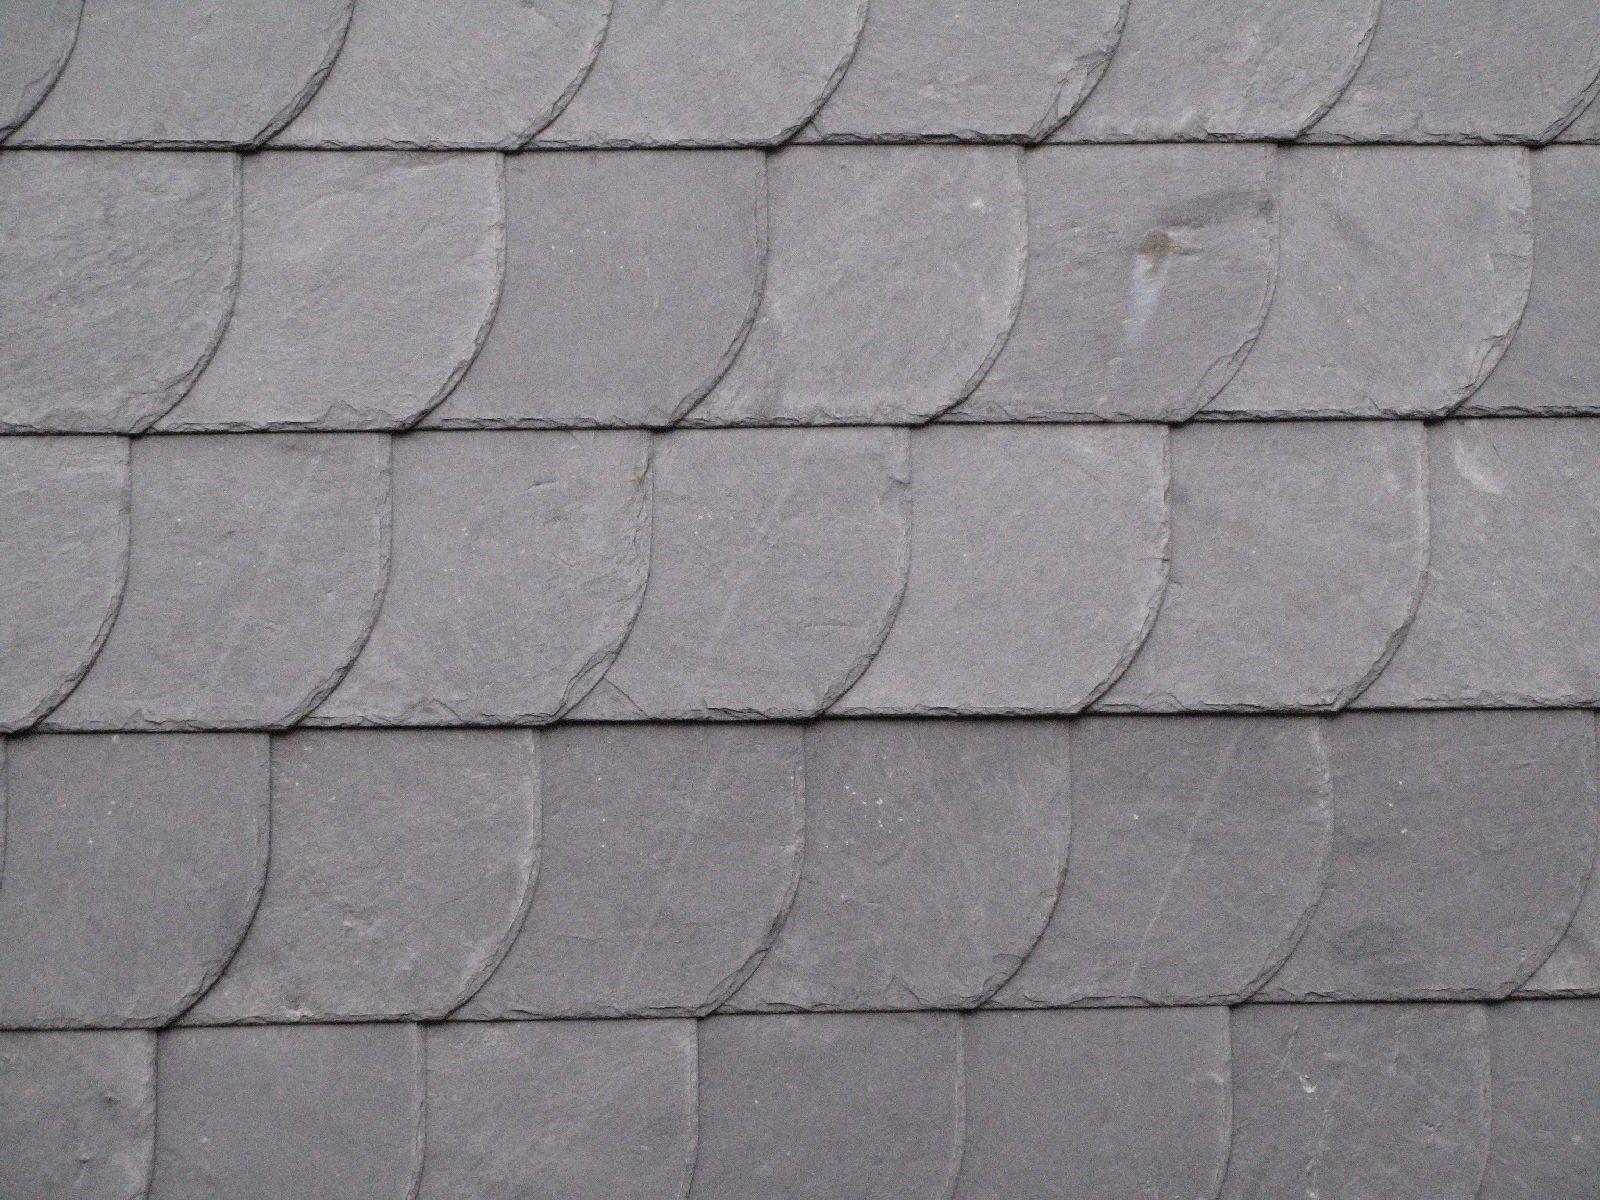 Stone_Texture_B_4812